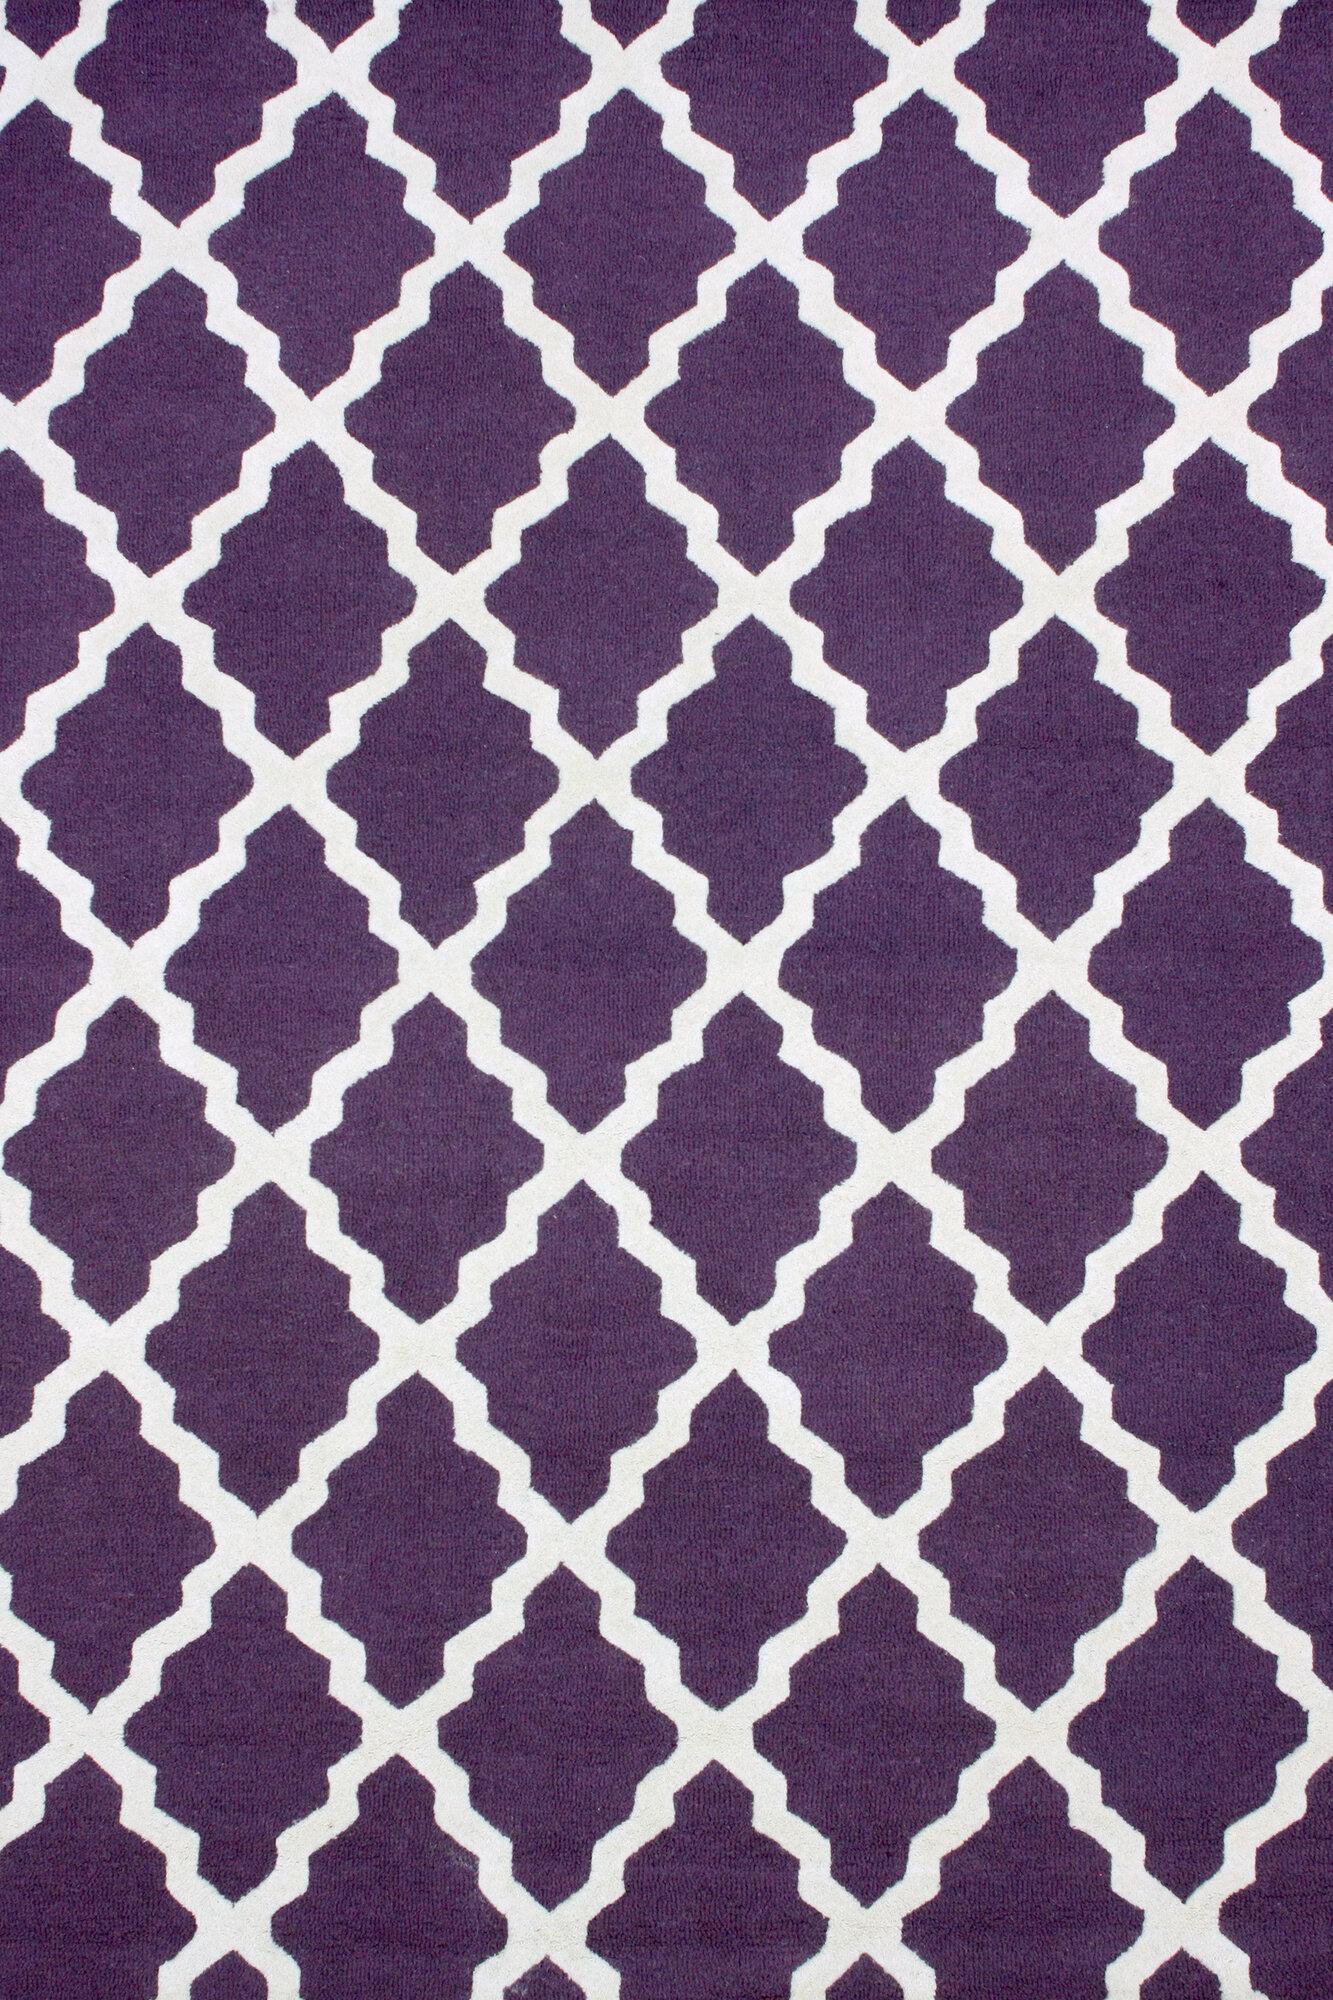 Attrayant ... Moderna Purple Marrakech Trellis Rug ...